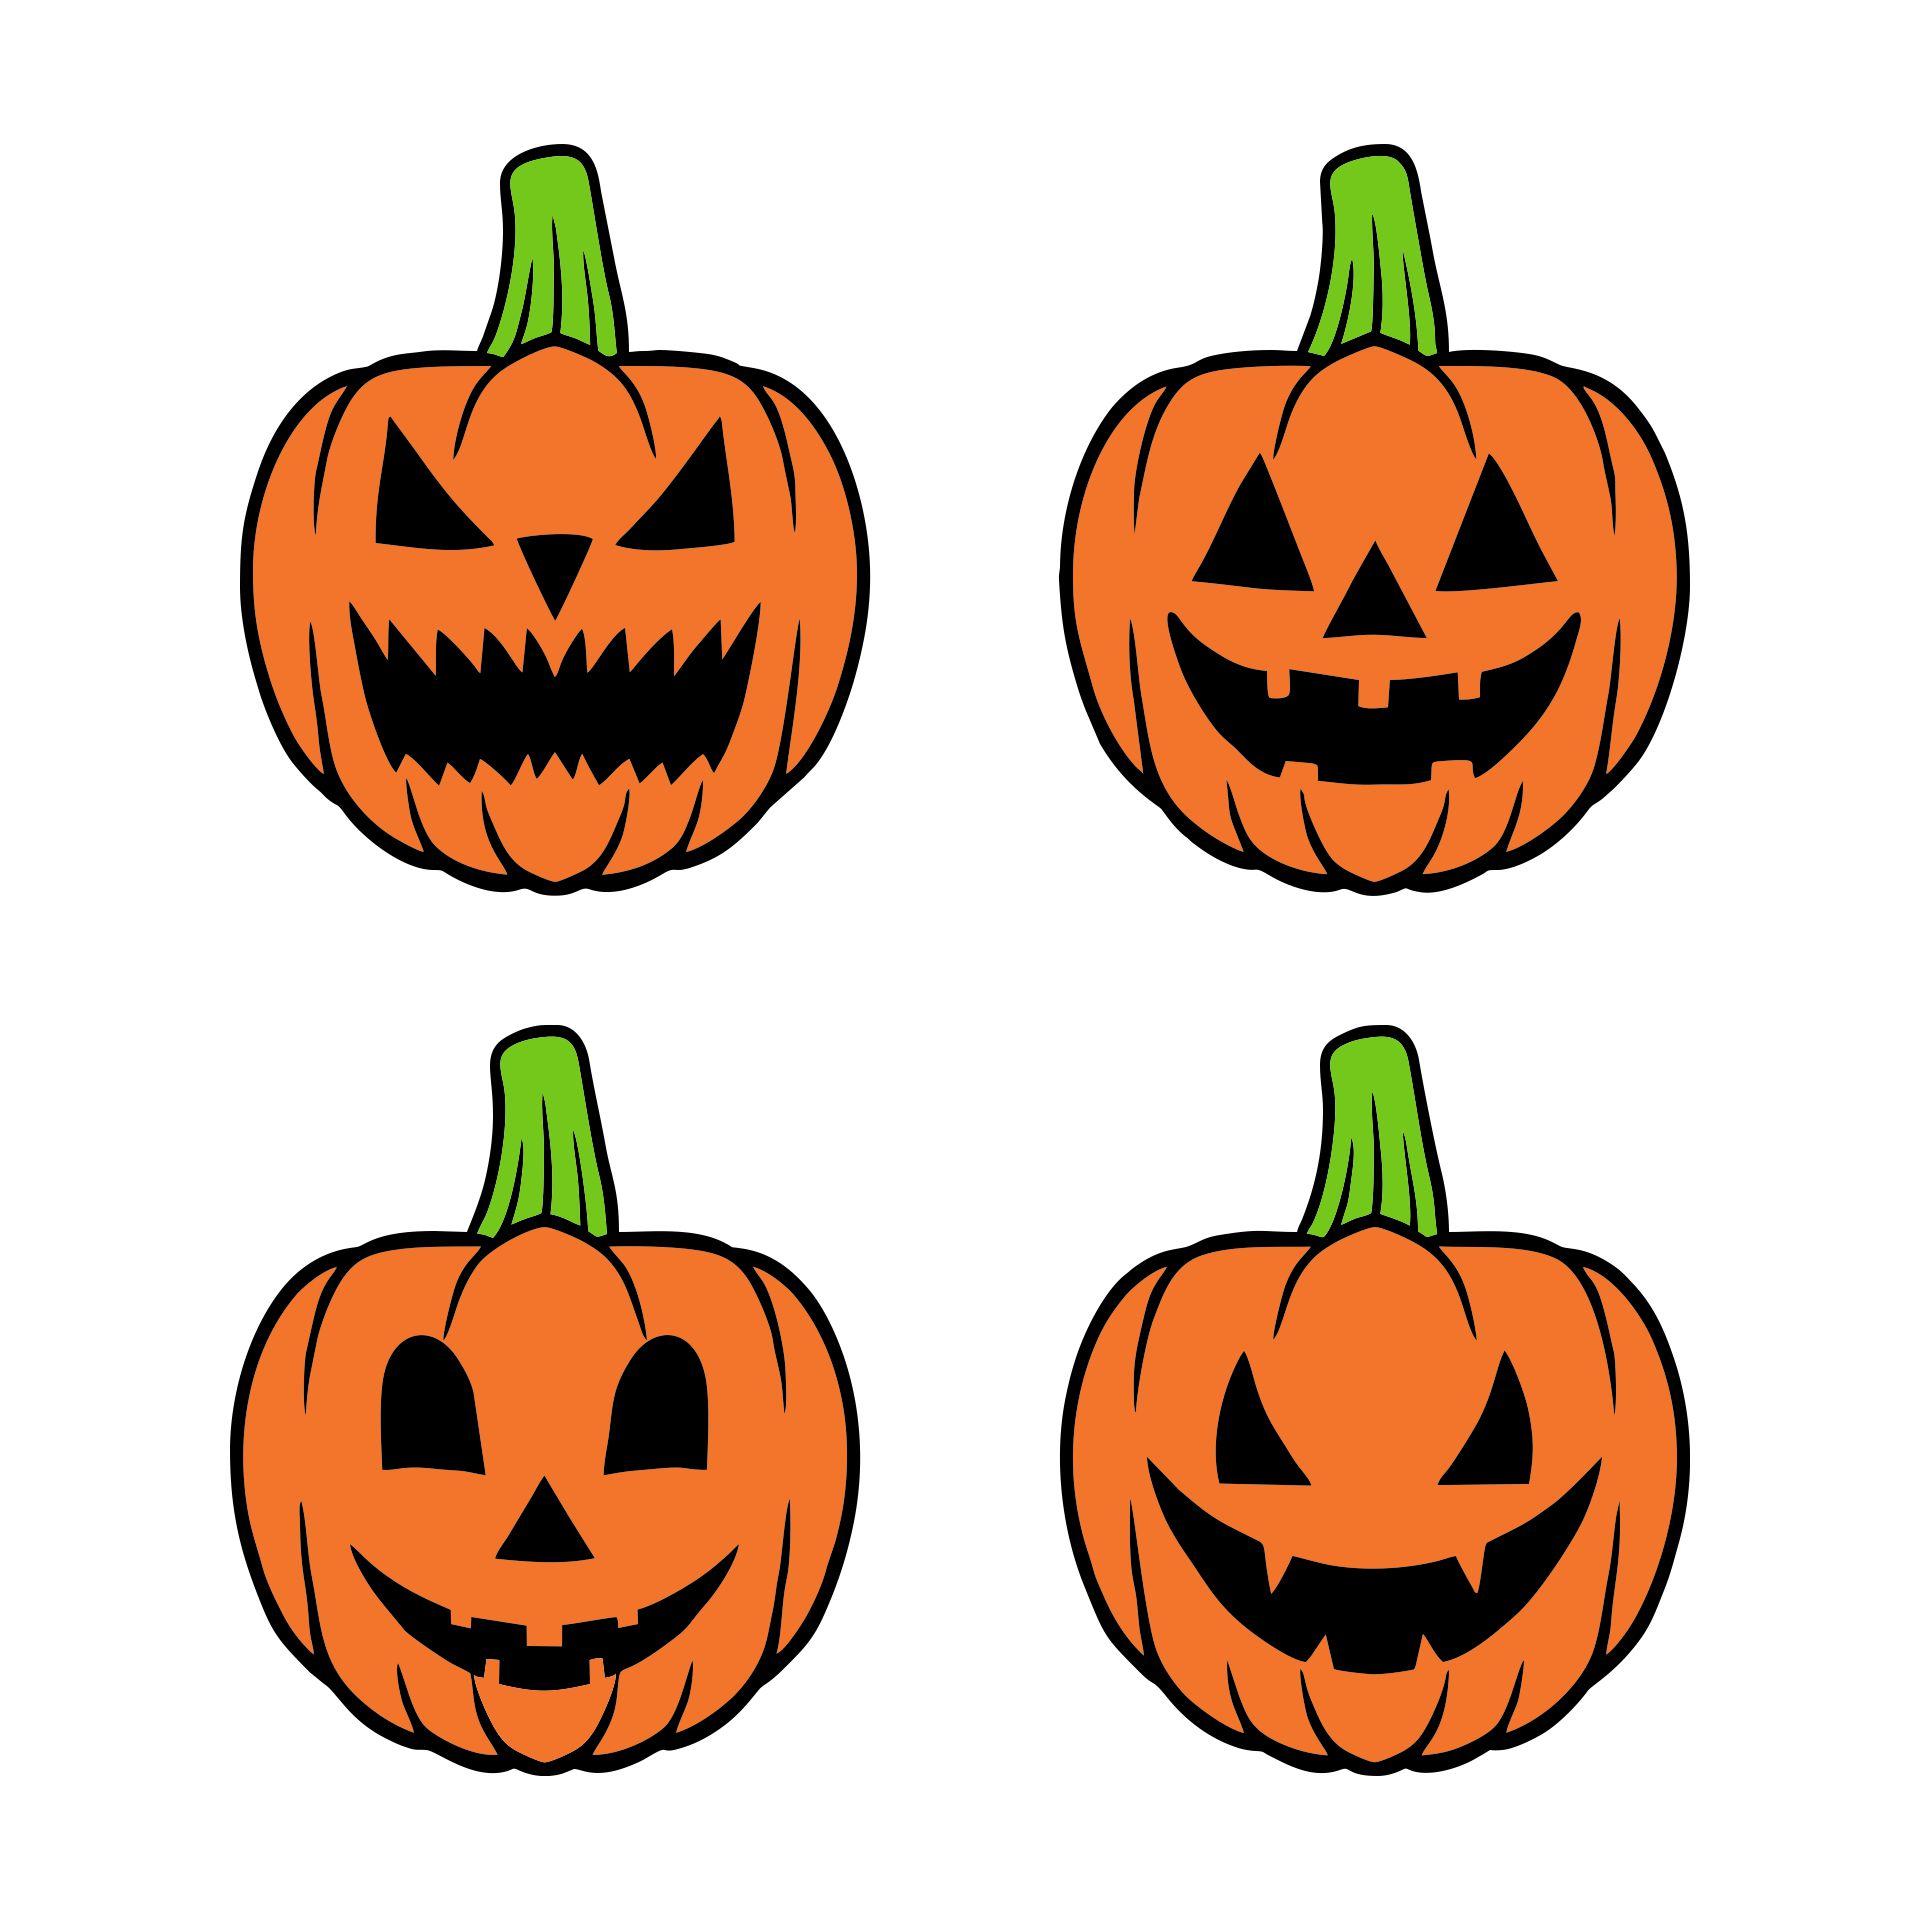 Paper Cut Out Pumpkin Happy